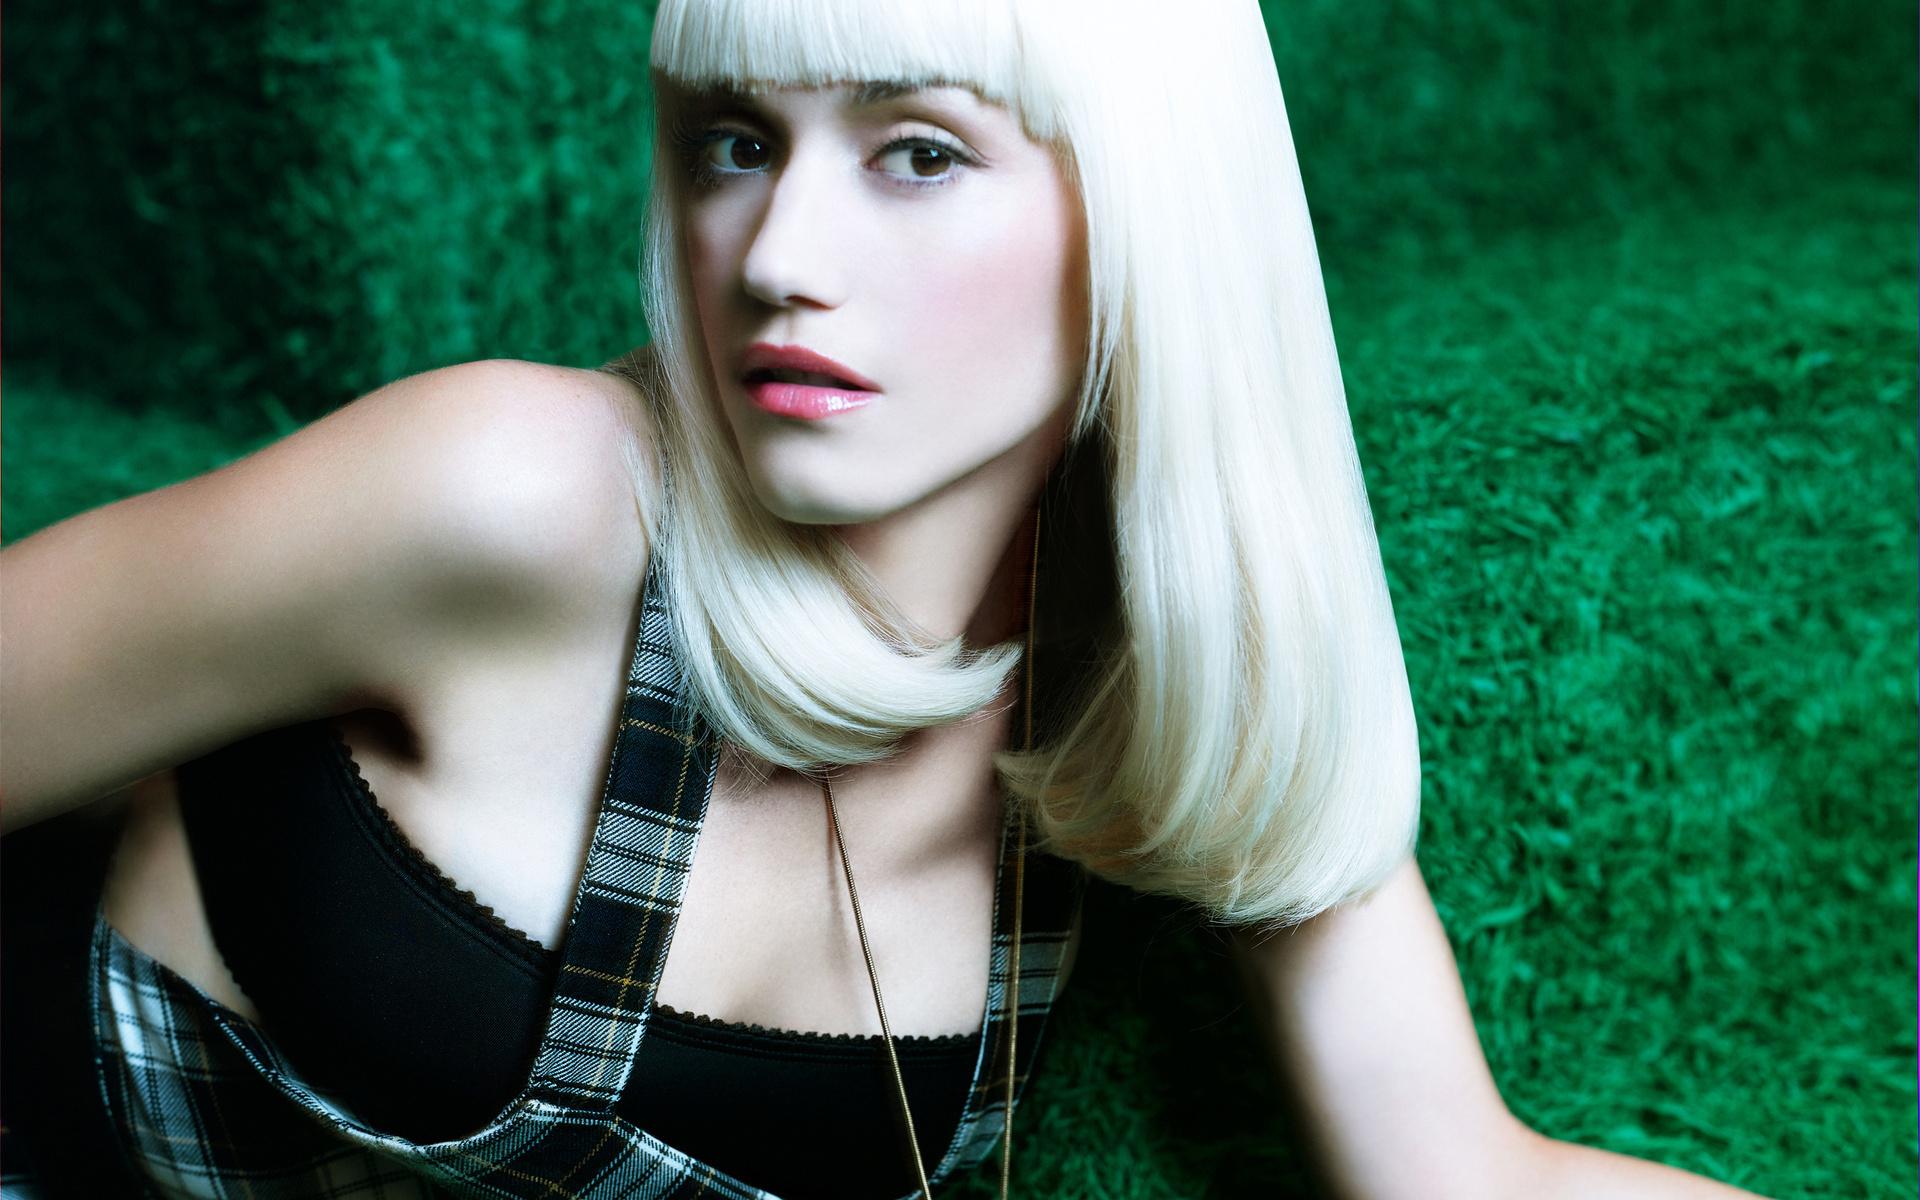 Gwen Stefani Wallpapers Hd